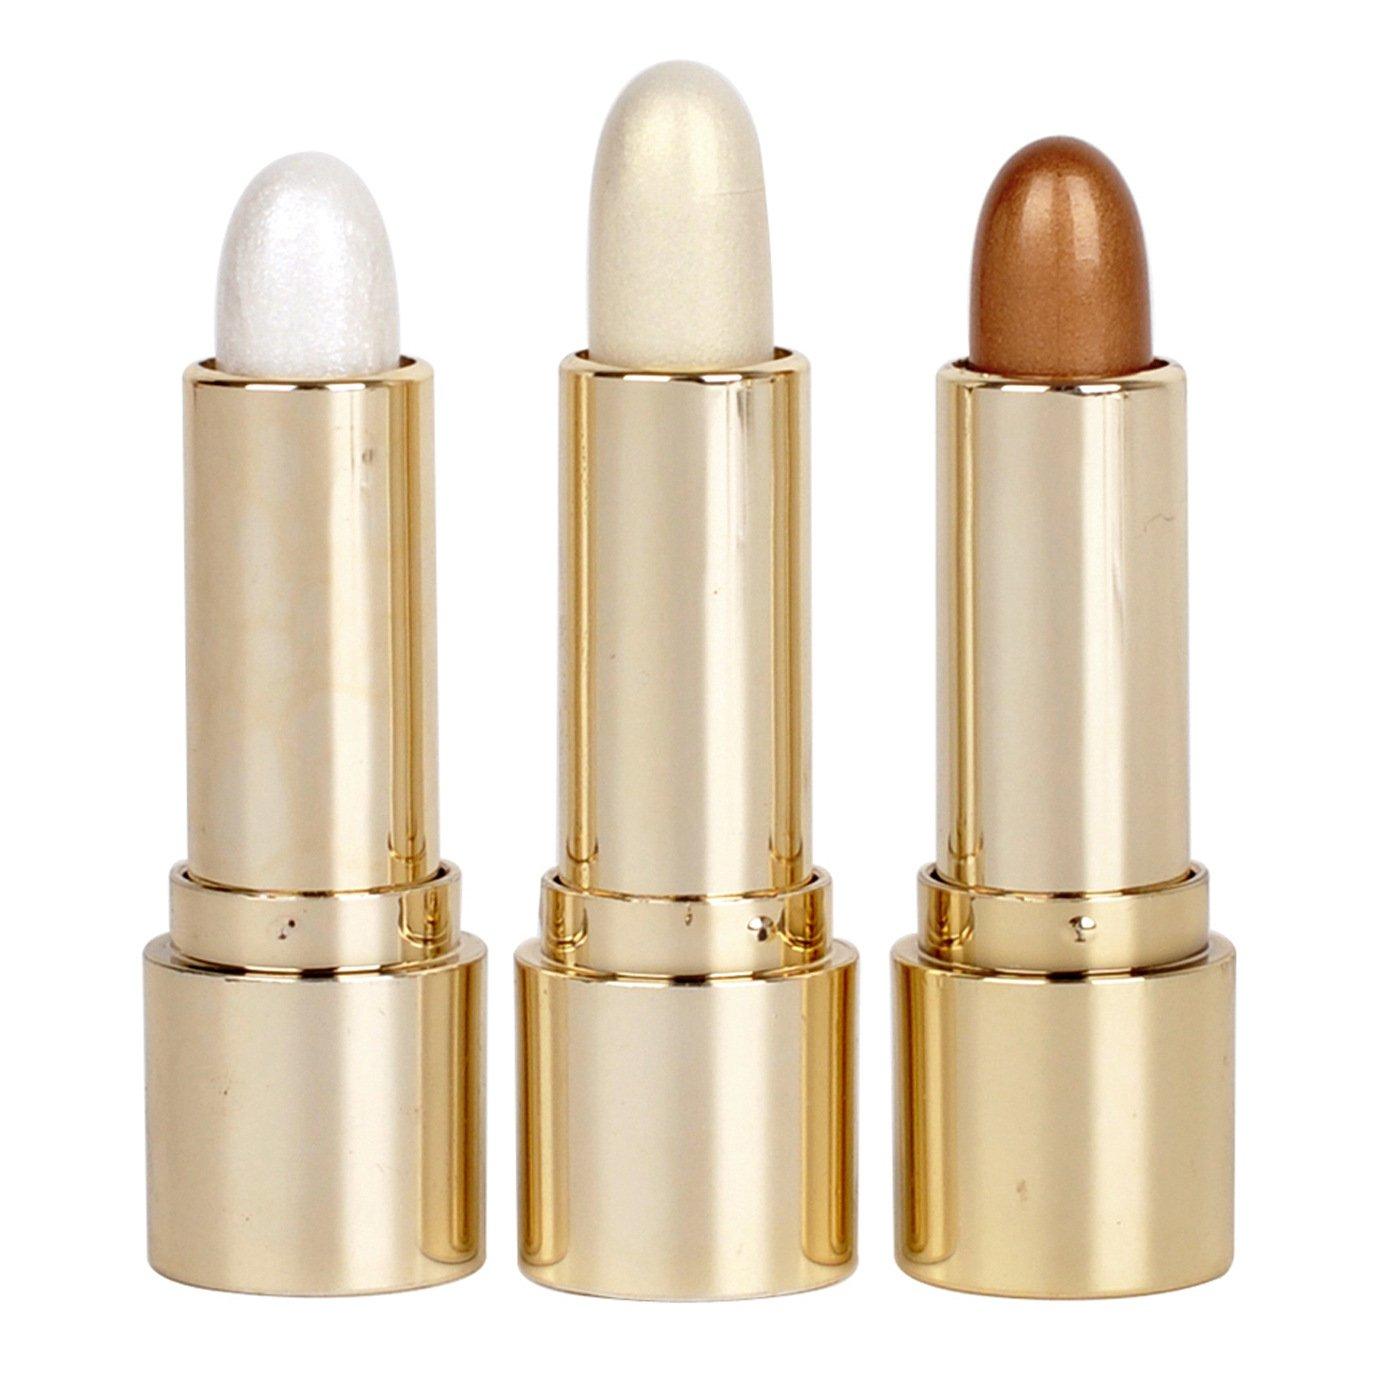 3 Colors Illuminator Makeup Sticks Highlight Repair Rods Face Eye Whitening Shimmer Stick